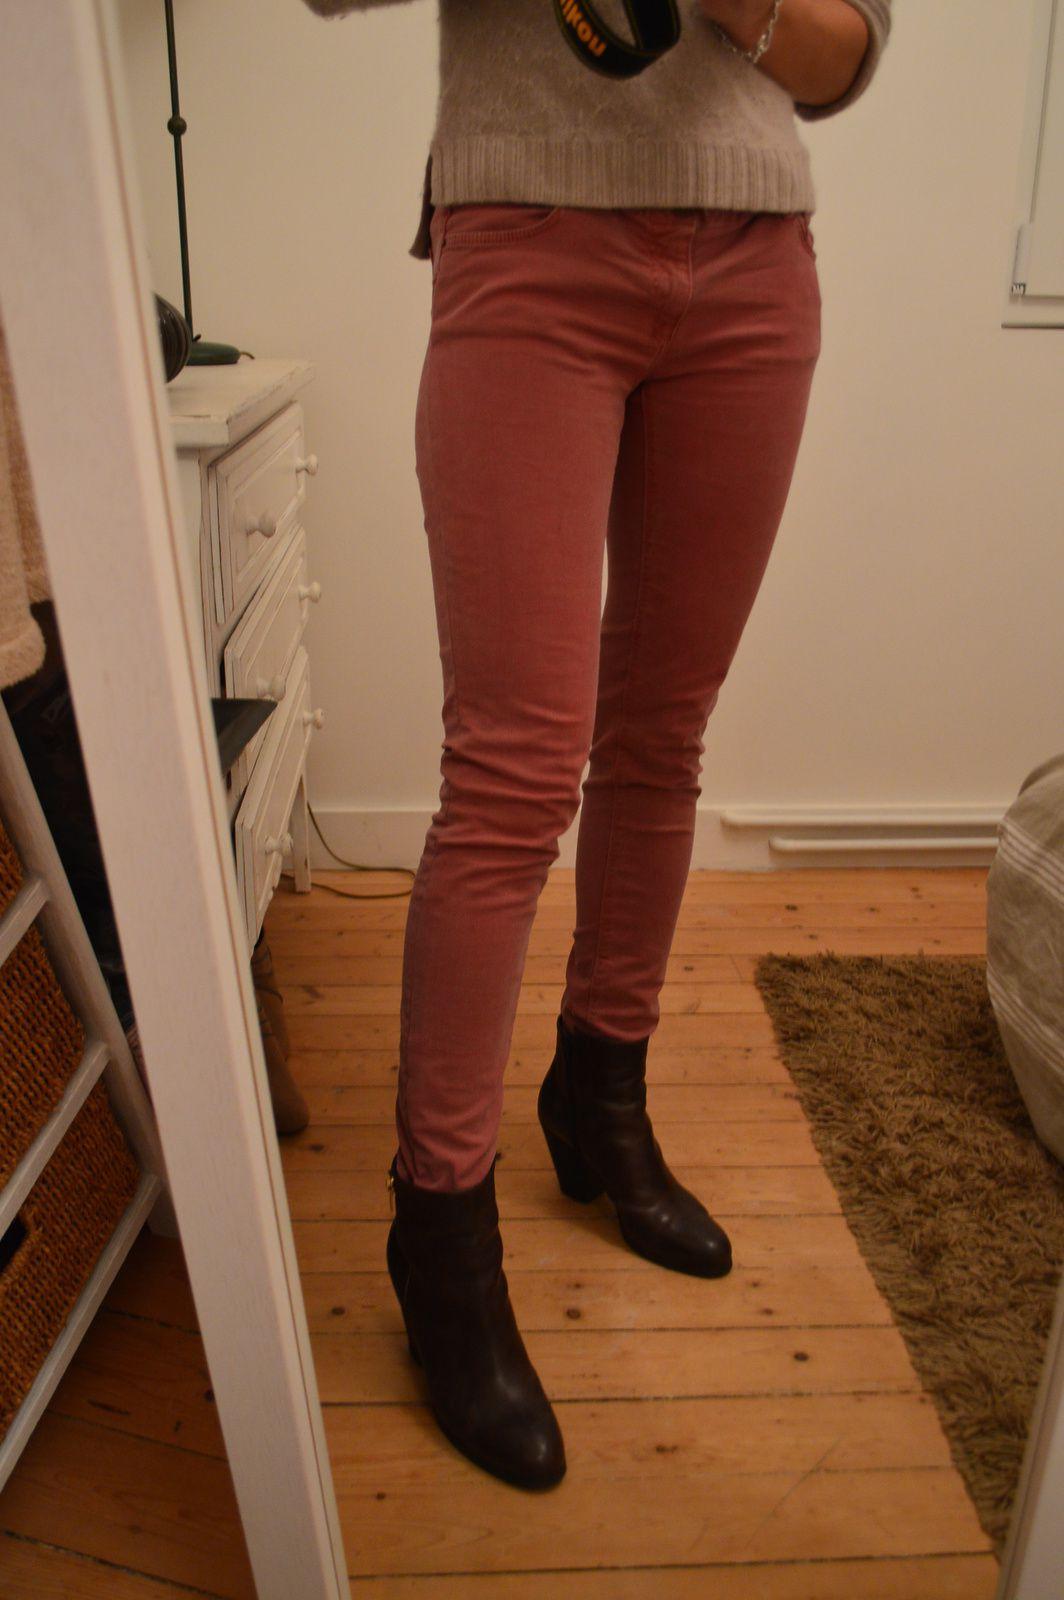 étape n°6 pantalon terminé